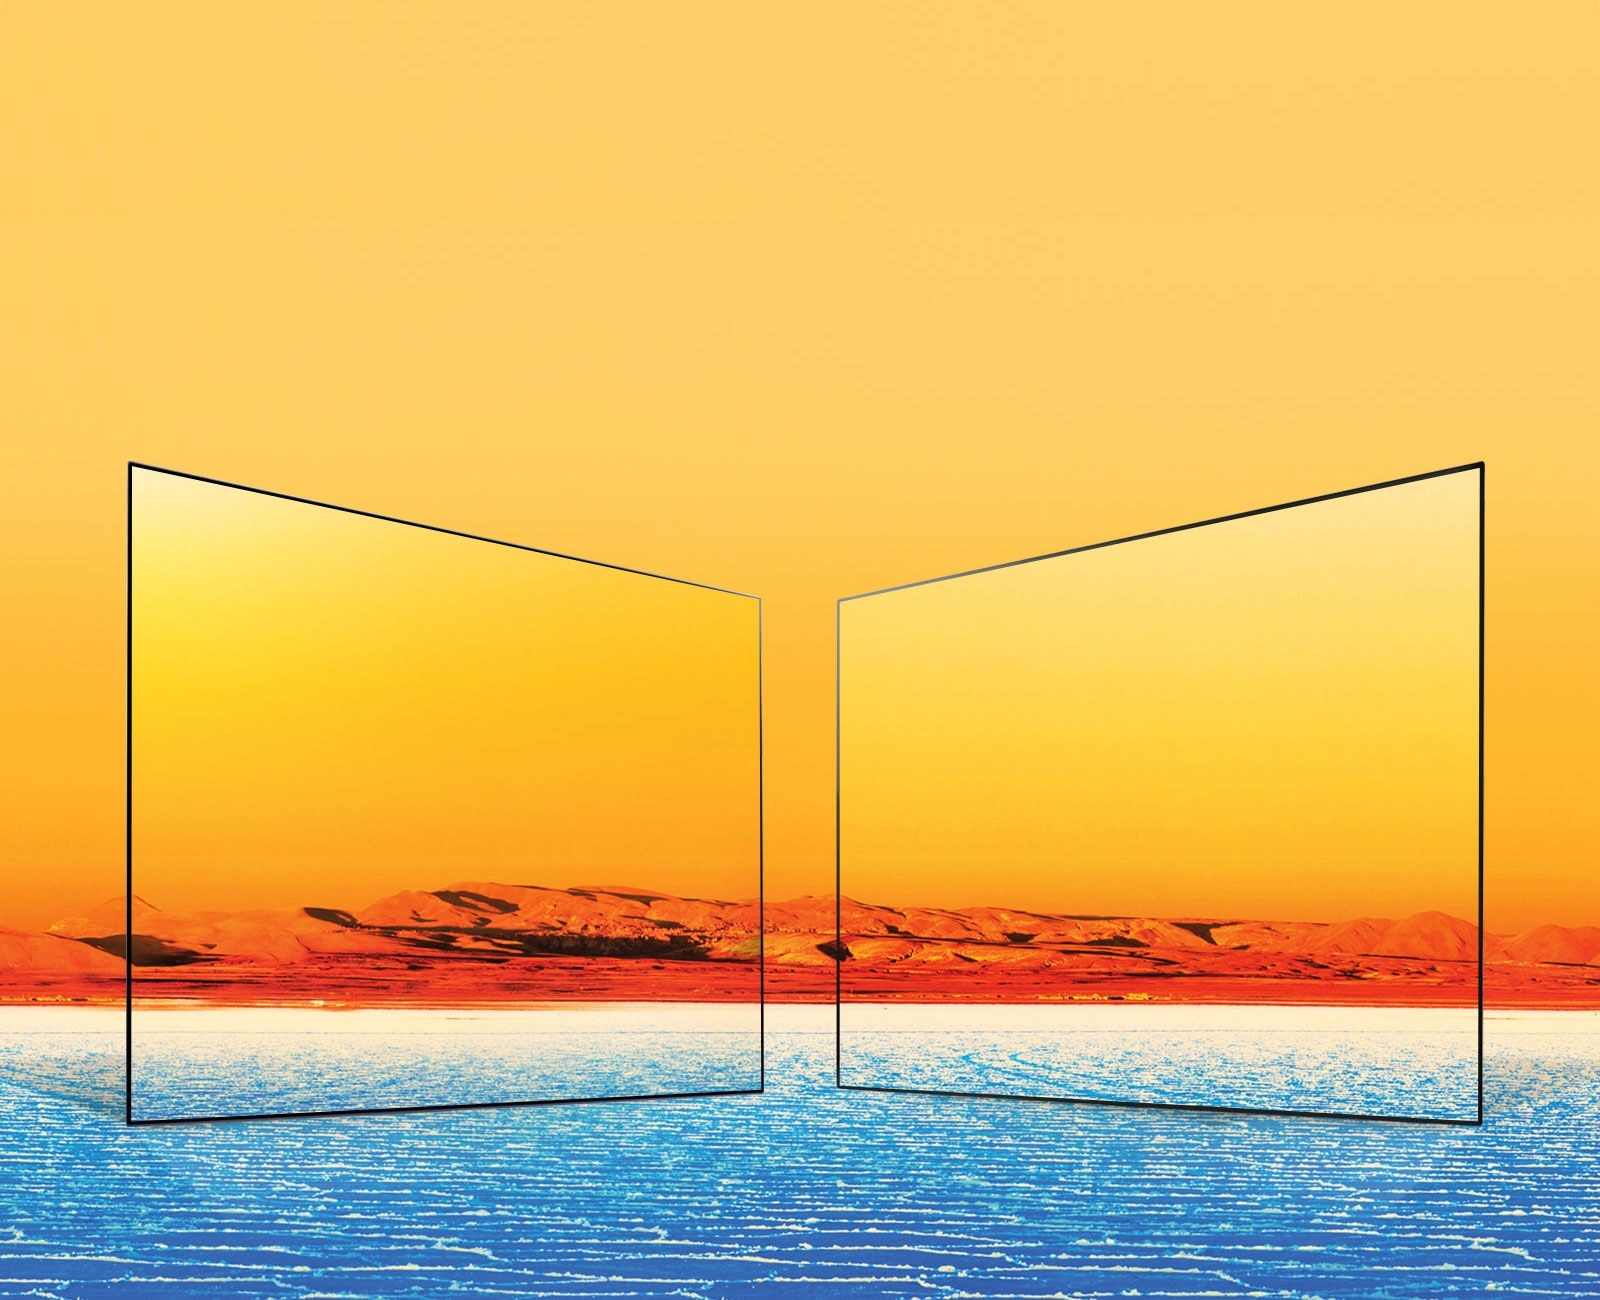 LG 65 Inch 4K Ultra HD Smart TV with HDR - 65UJ6300